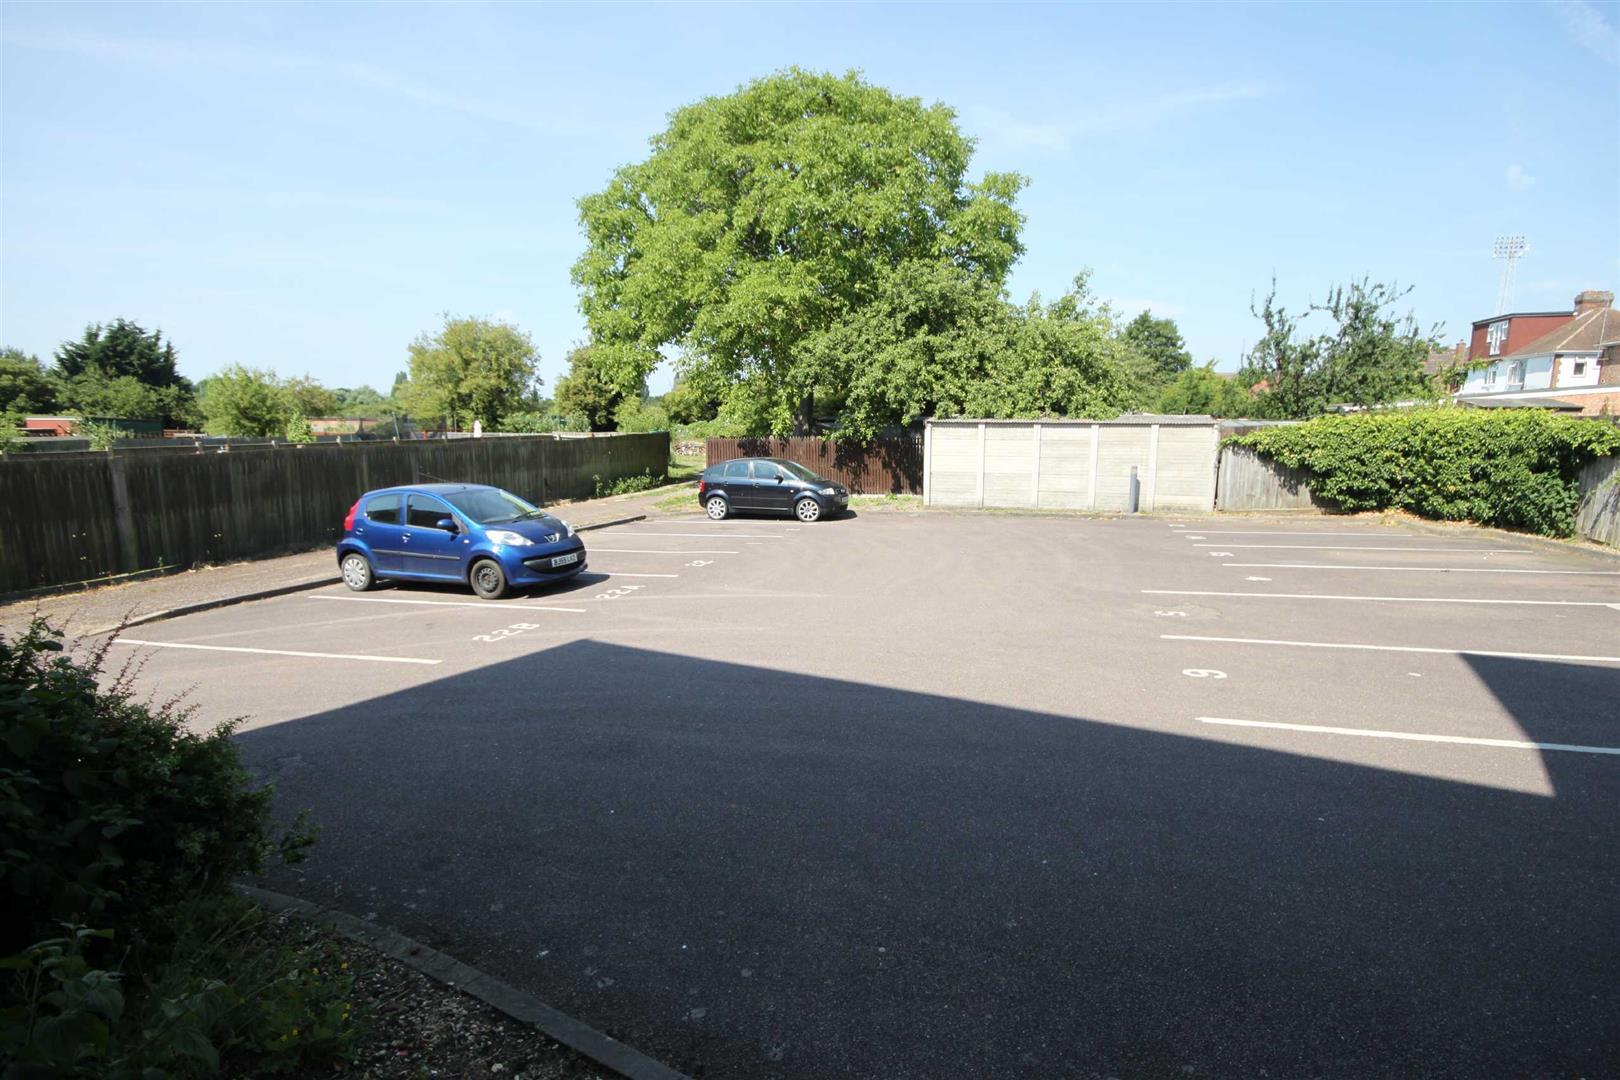 Hollyoake Court, Whitehill Road, Cambridge